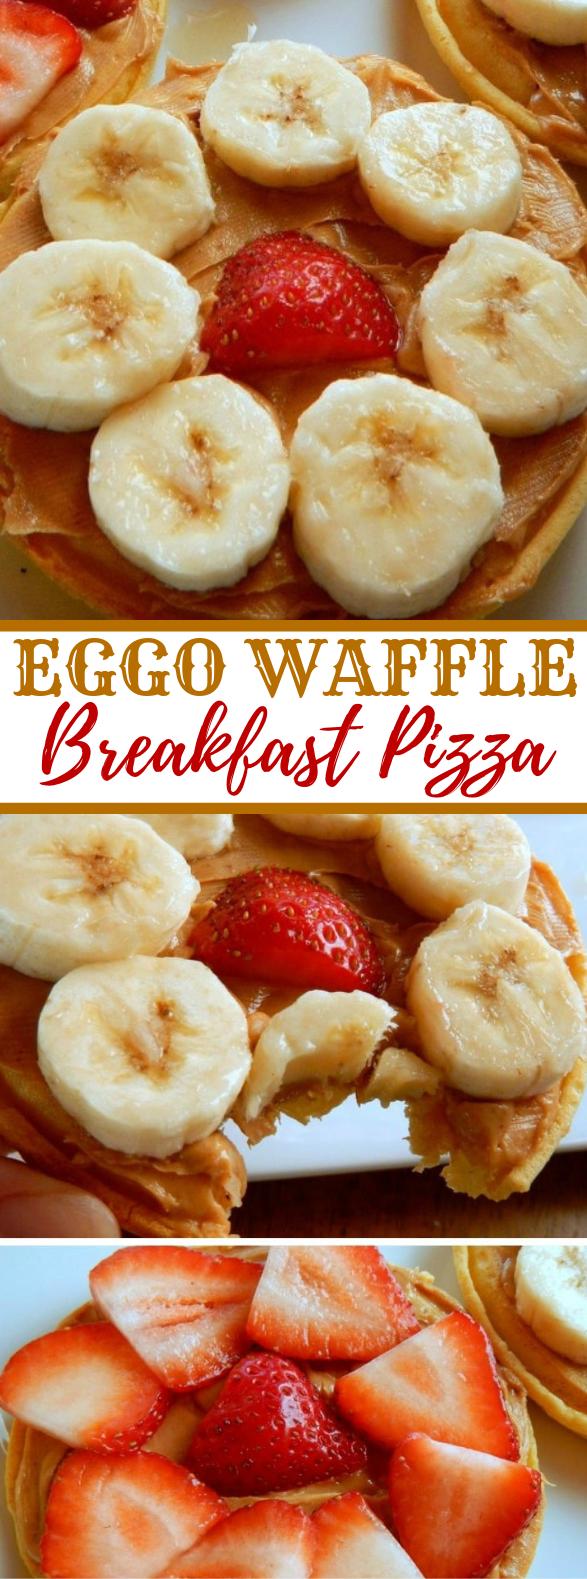 Eggo Waffle Breakfast Pizza #healthy #diet